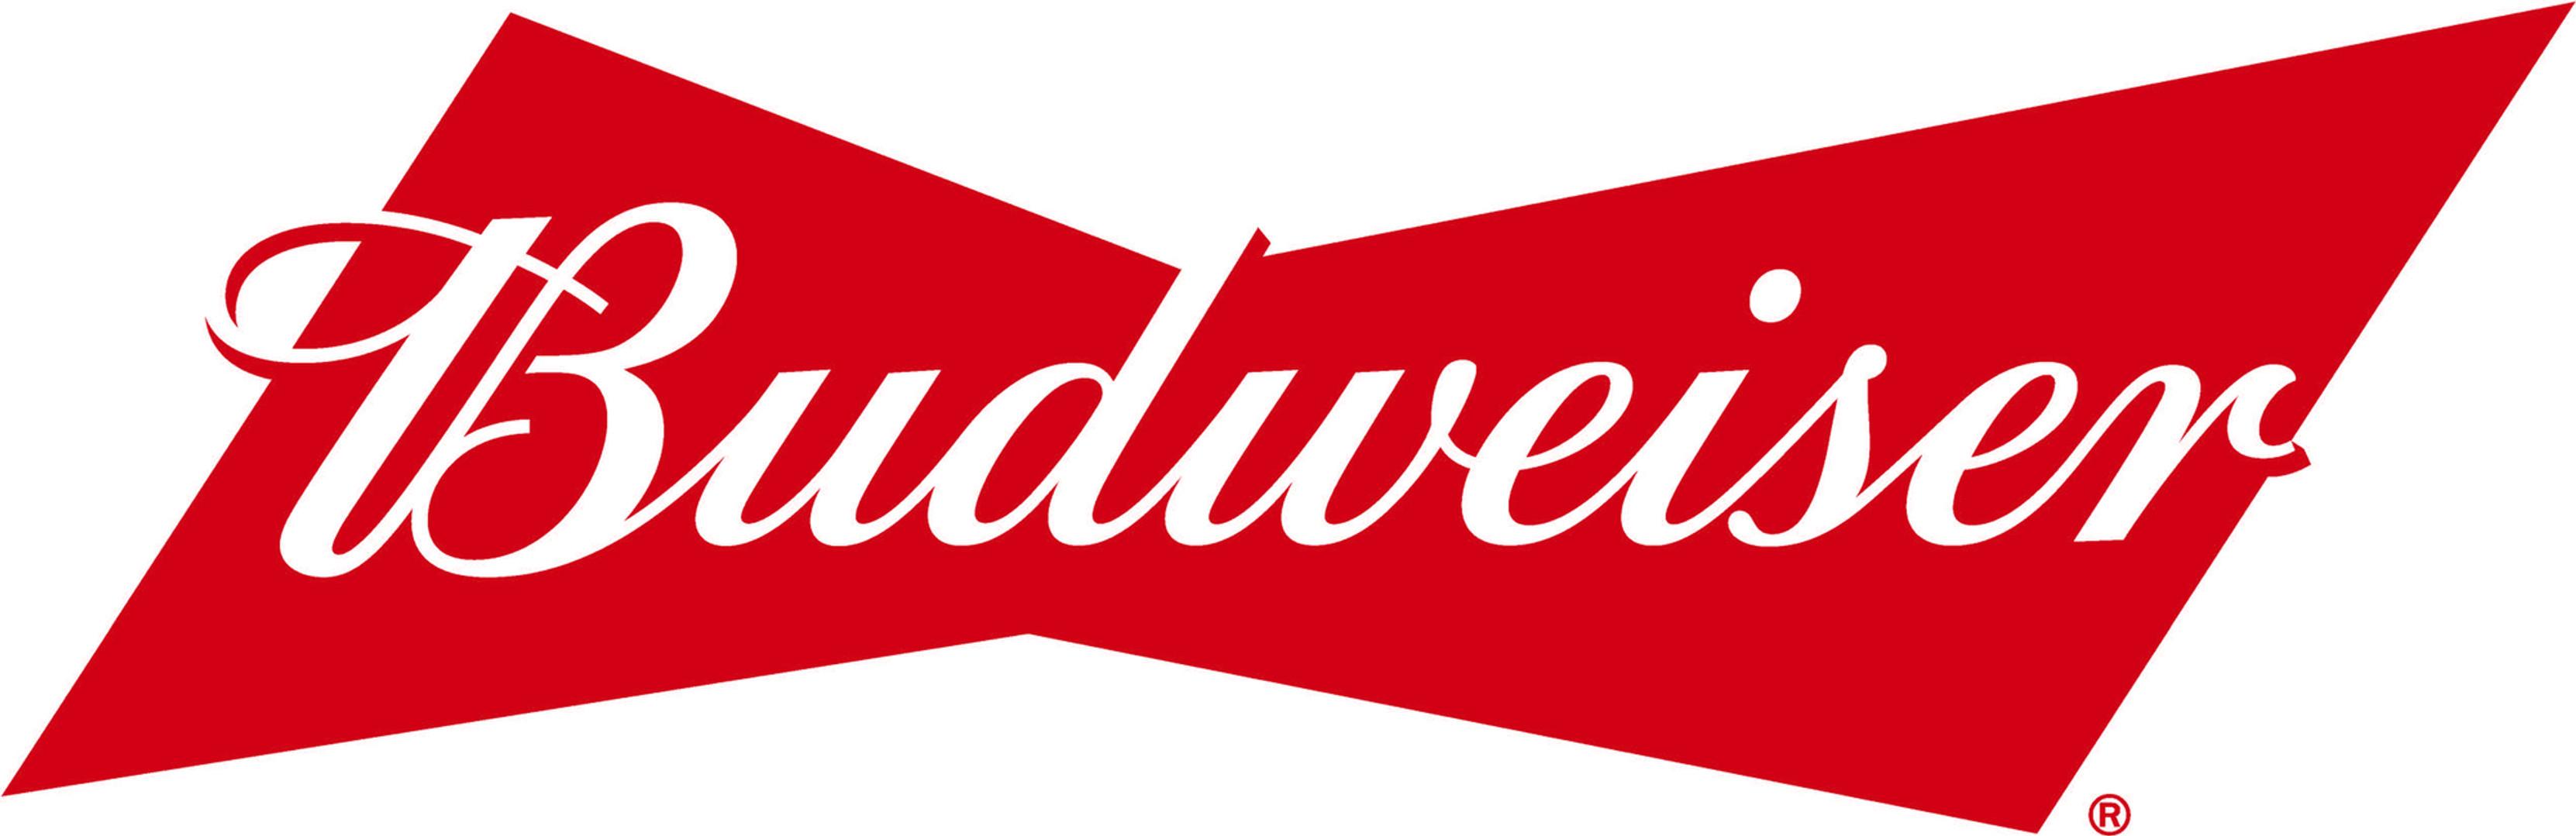 budweiser-logo-2016.jpg